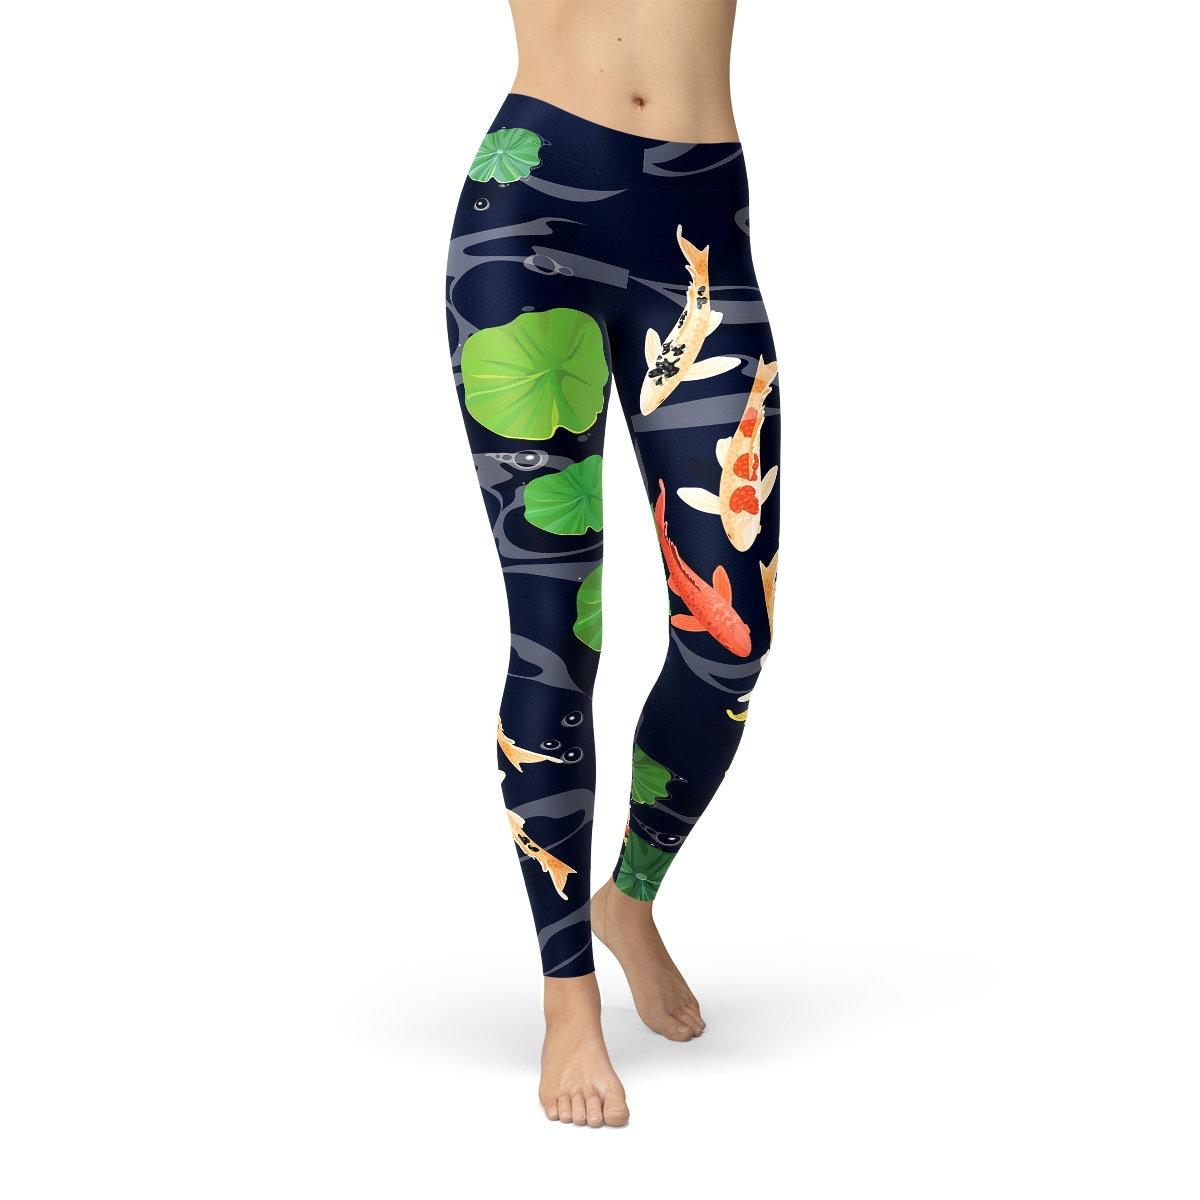 bc4df457d1bf2 Koi Fish Yoga Pants Under Water Carp Fish Yoga Pants Koi